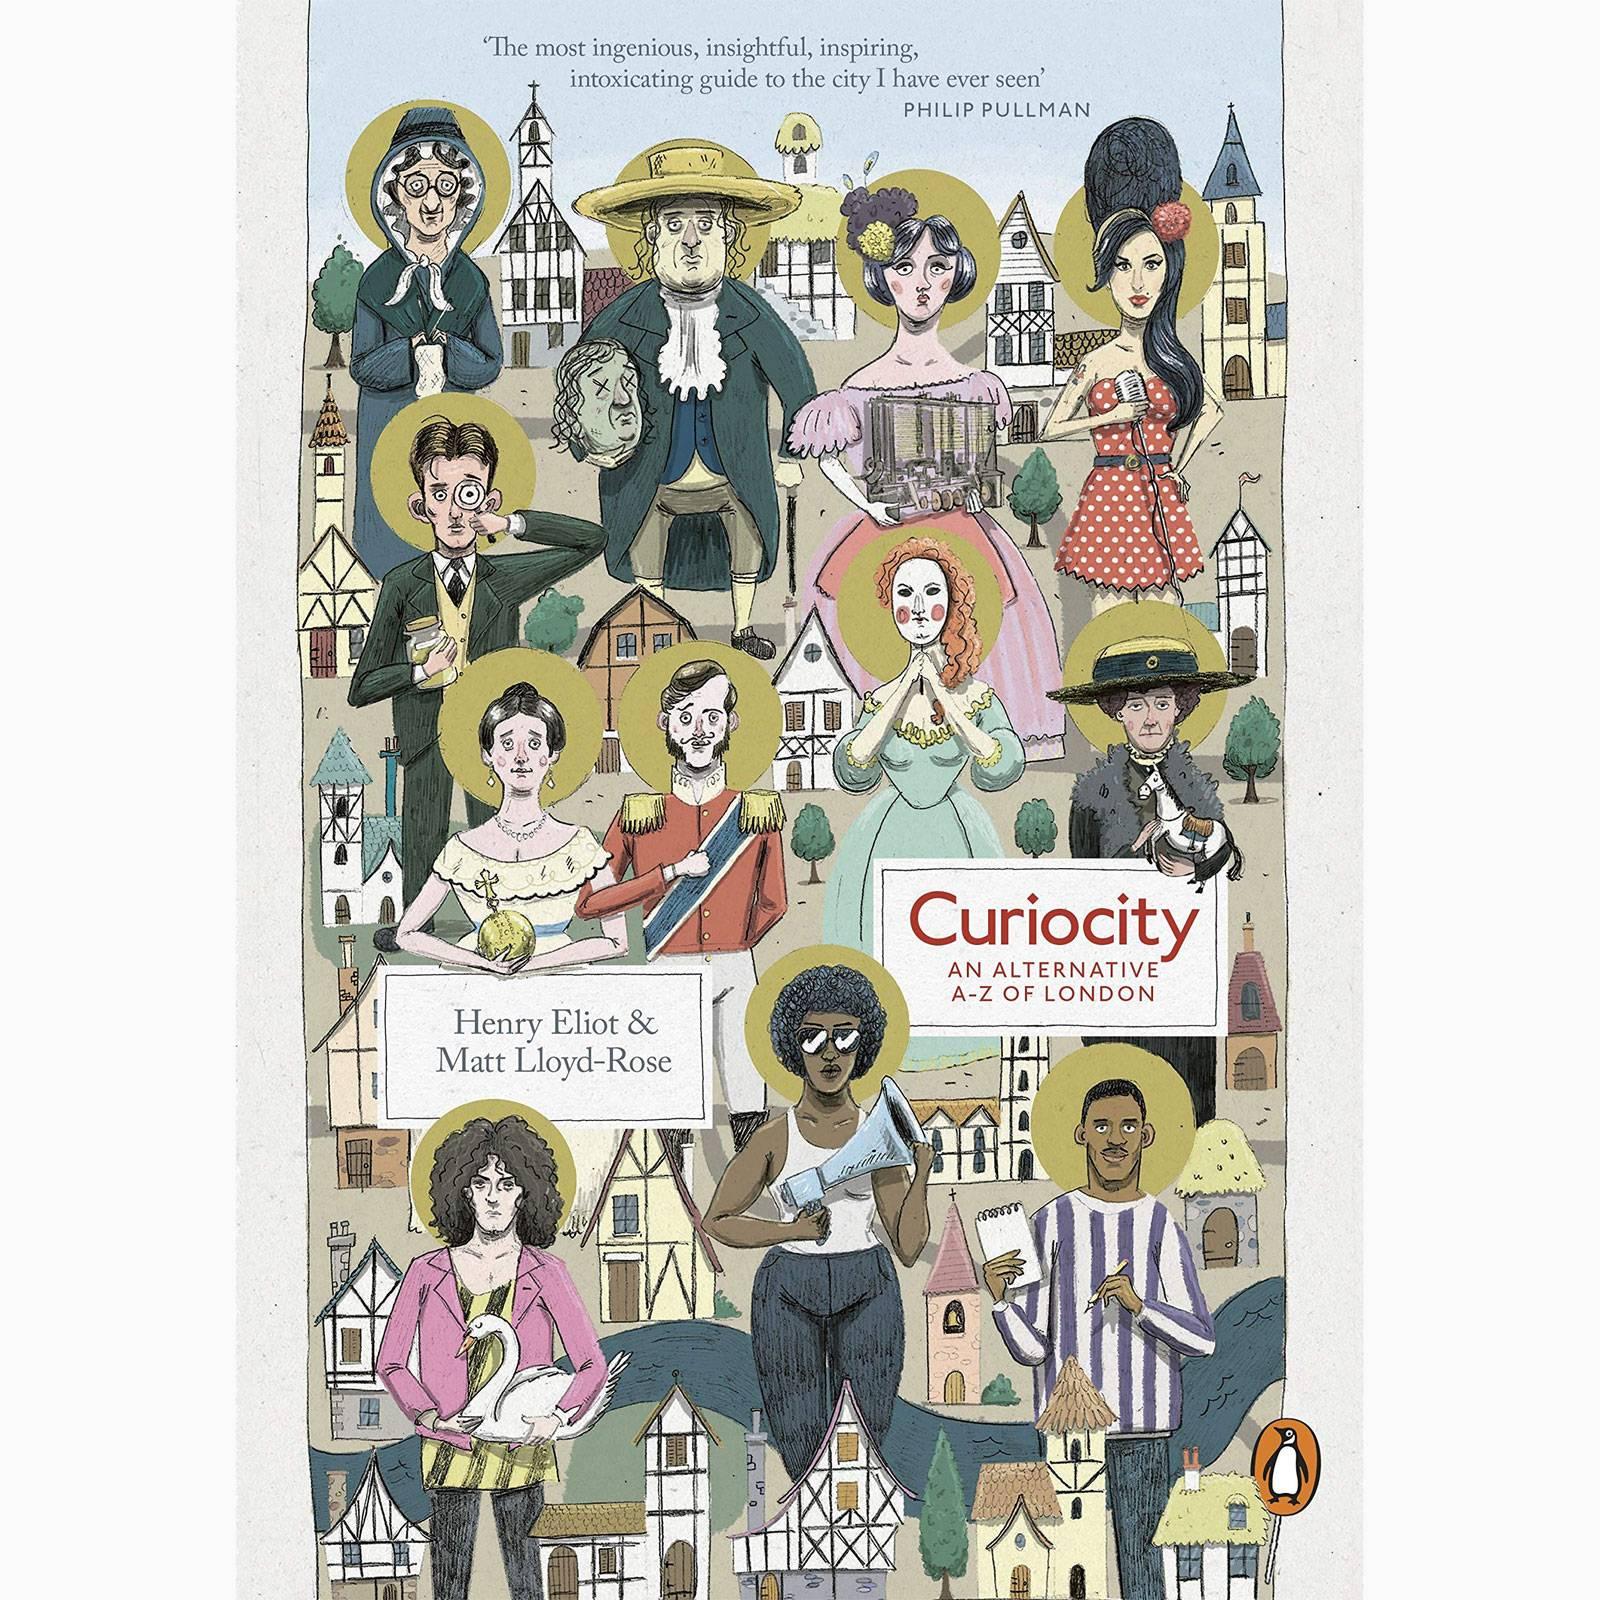 Curiocity: An Alternative A To Z - Paperback Book